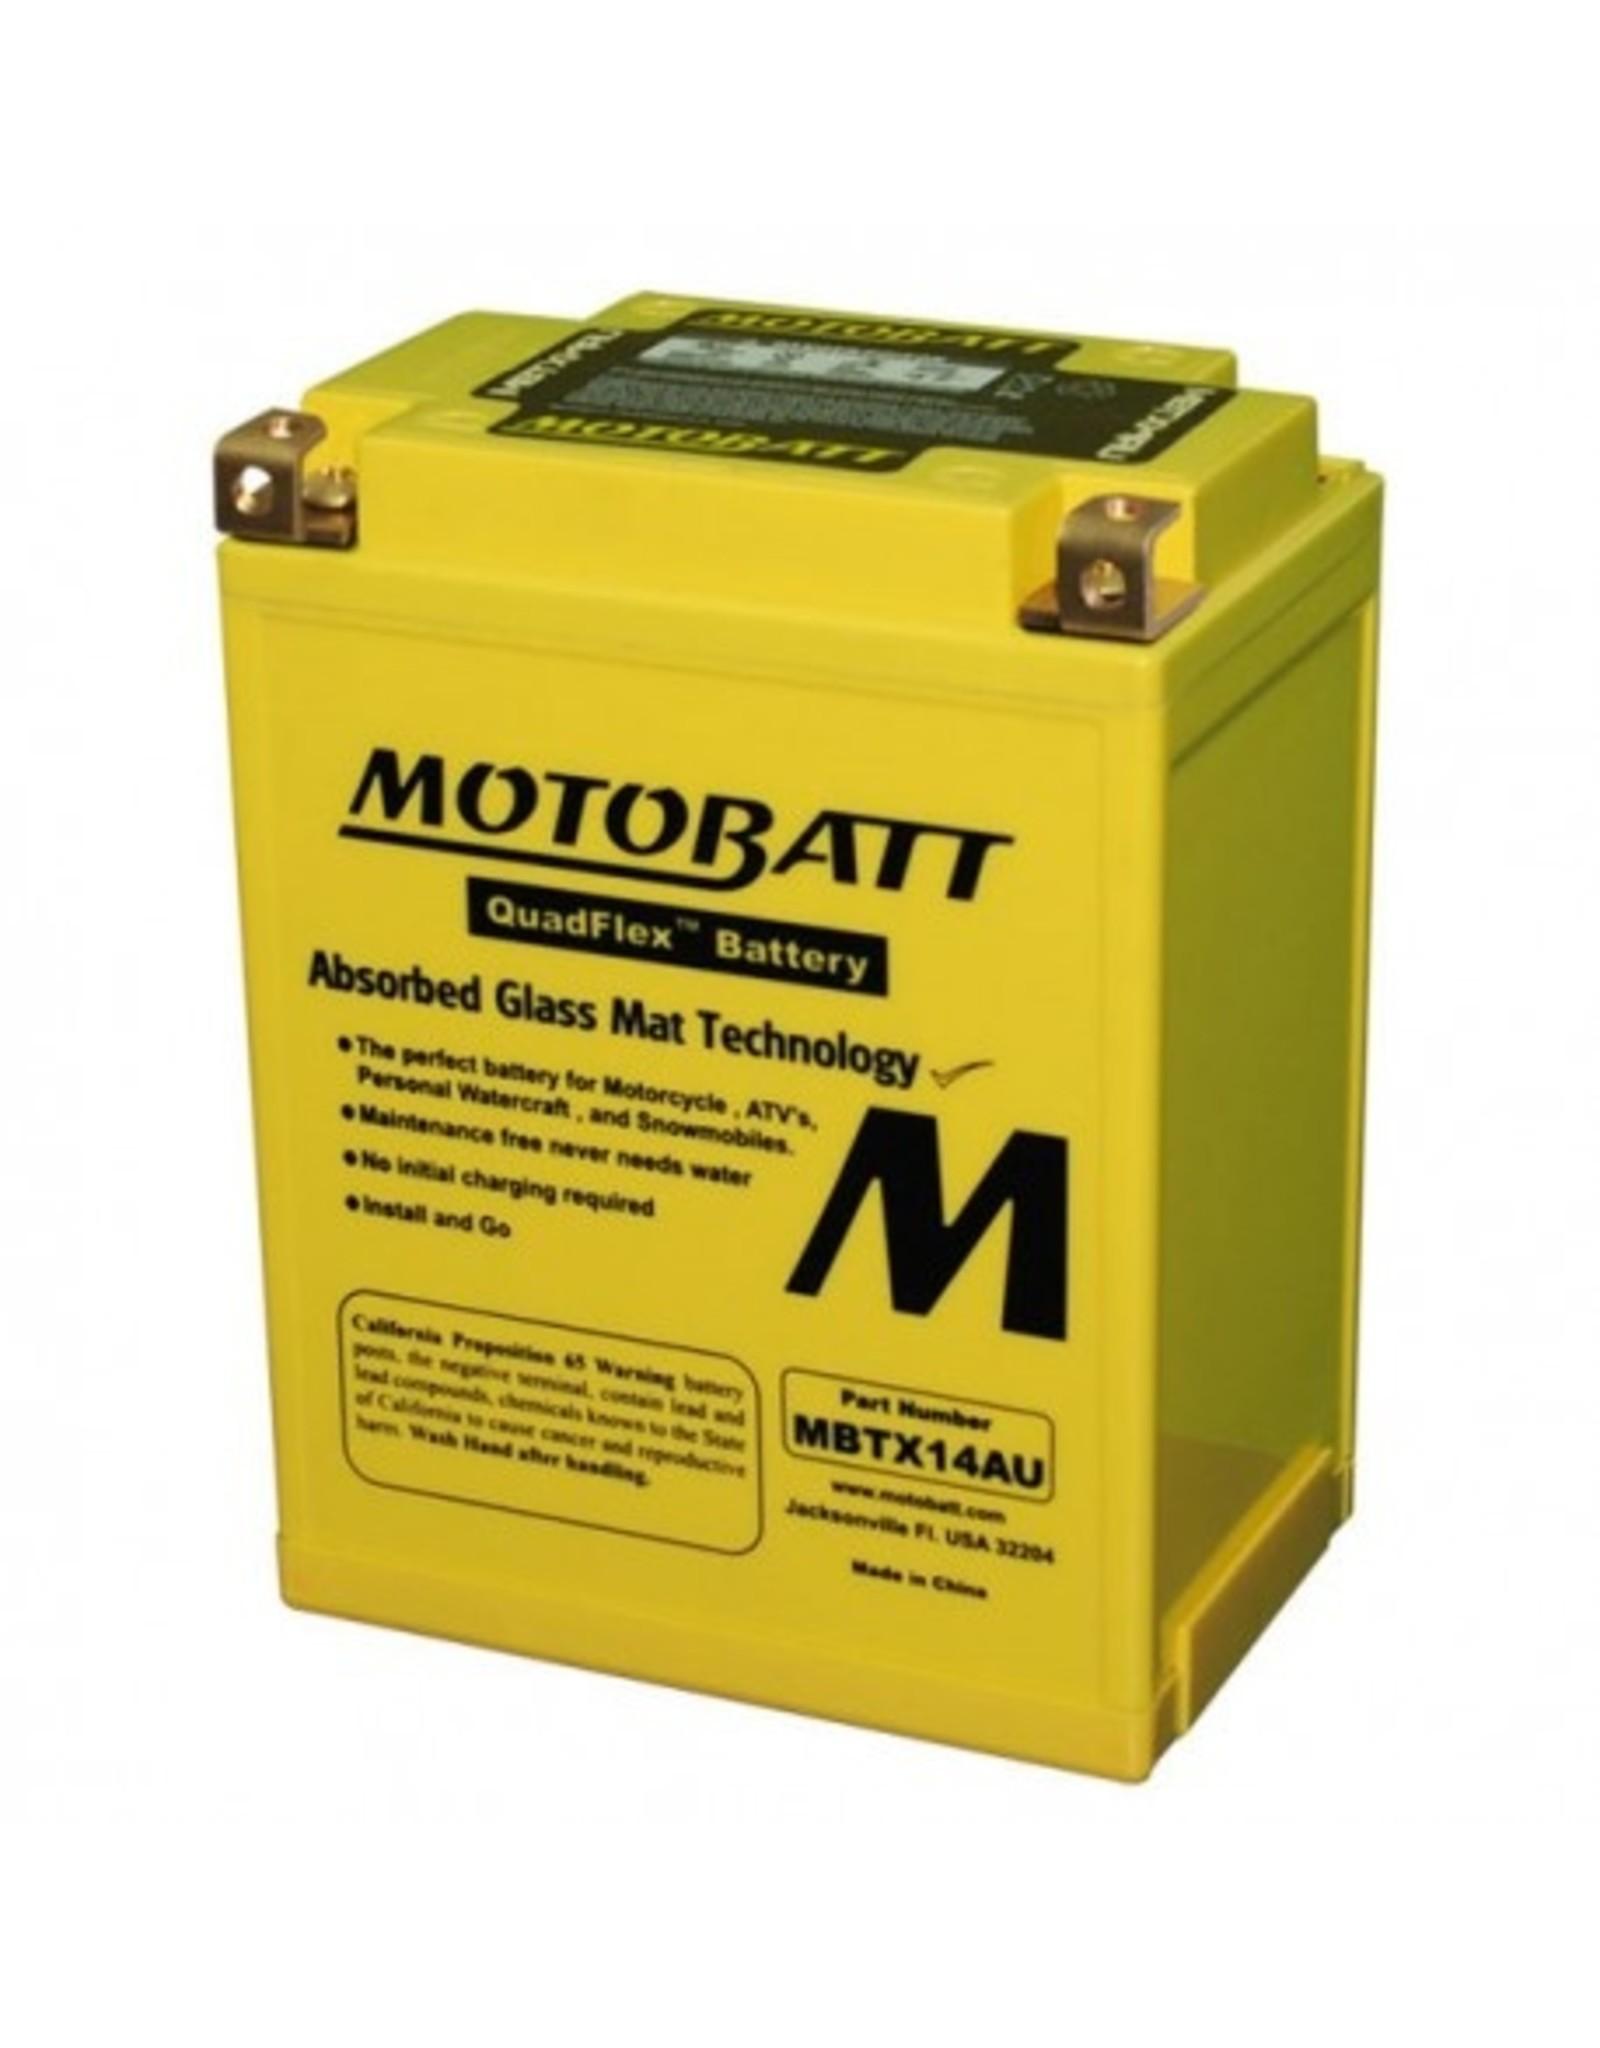 MOTOBATT MOTOBATT MBTX14AU